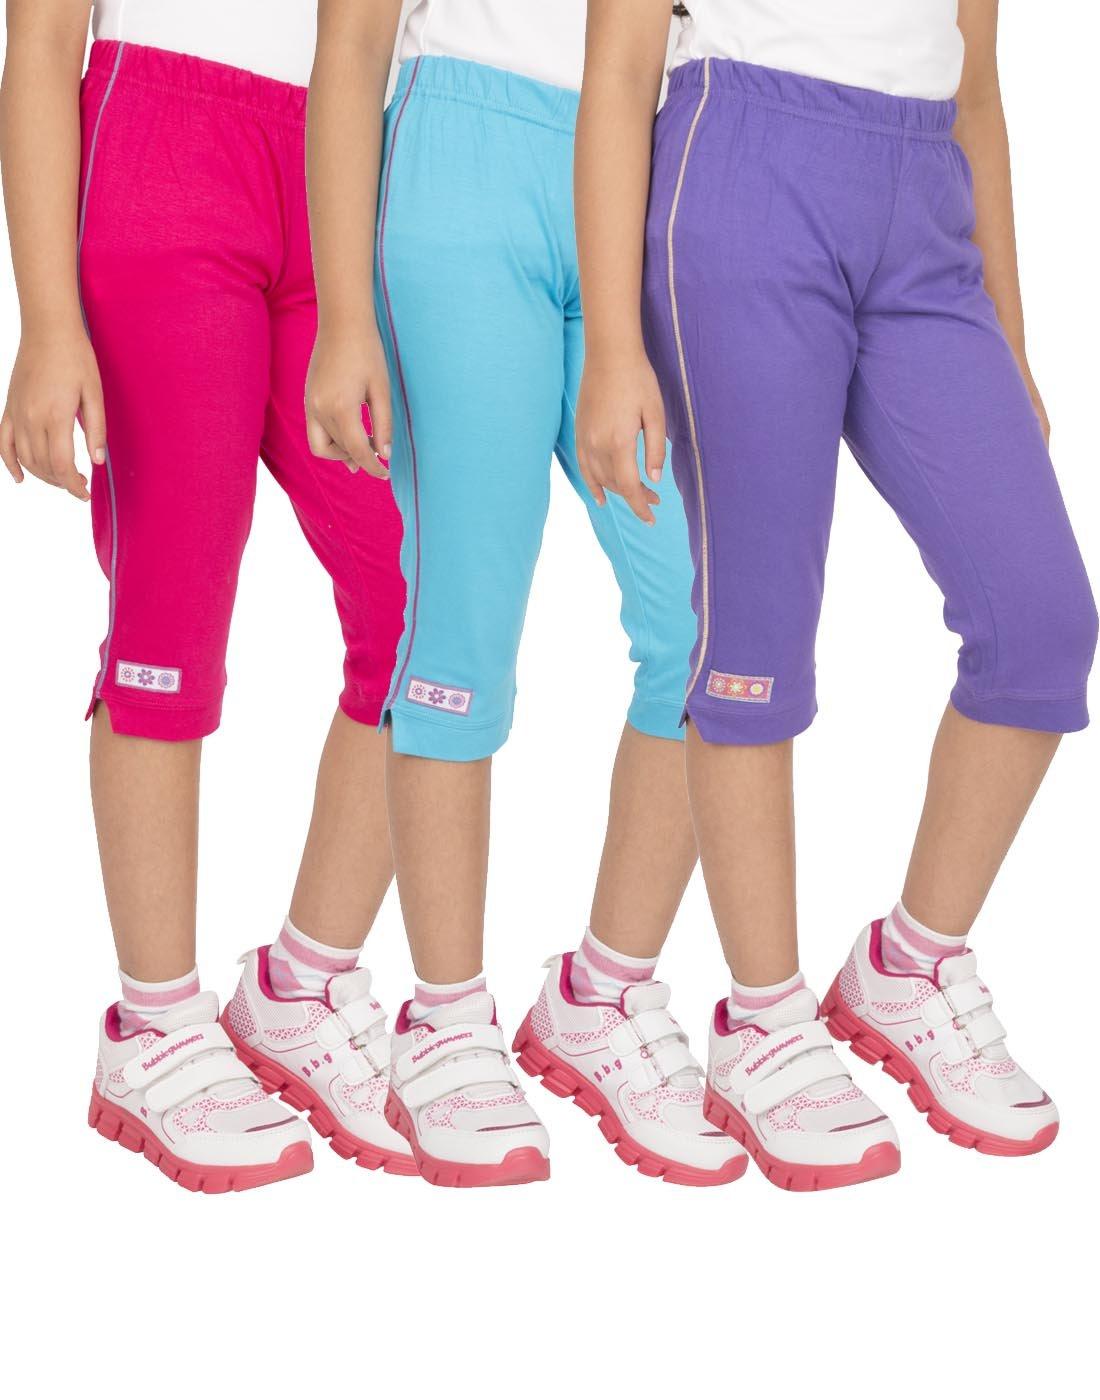 OCEAN RACE Girls attarctive Colors Cotton Capris(3/4 Th Pant)-Pack of 3 product image